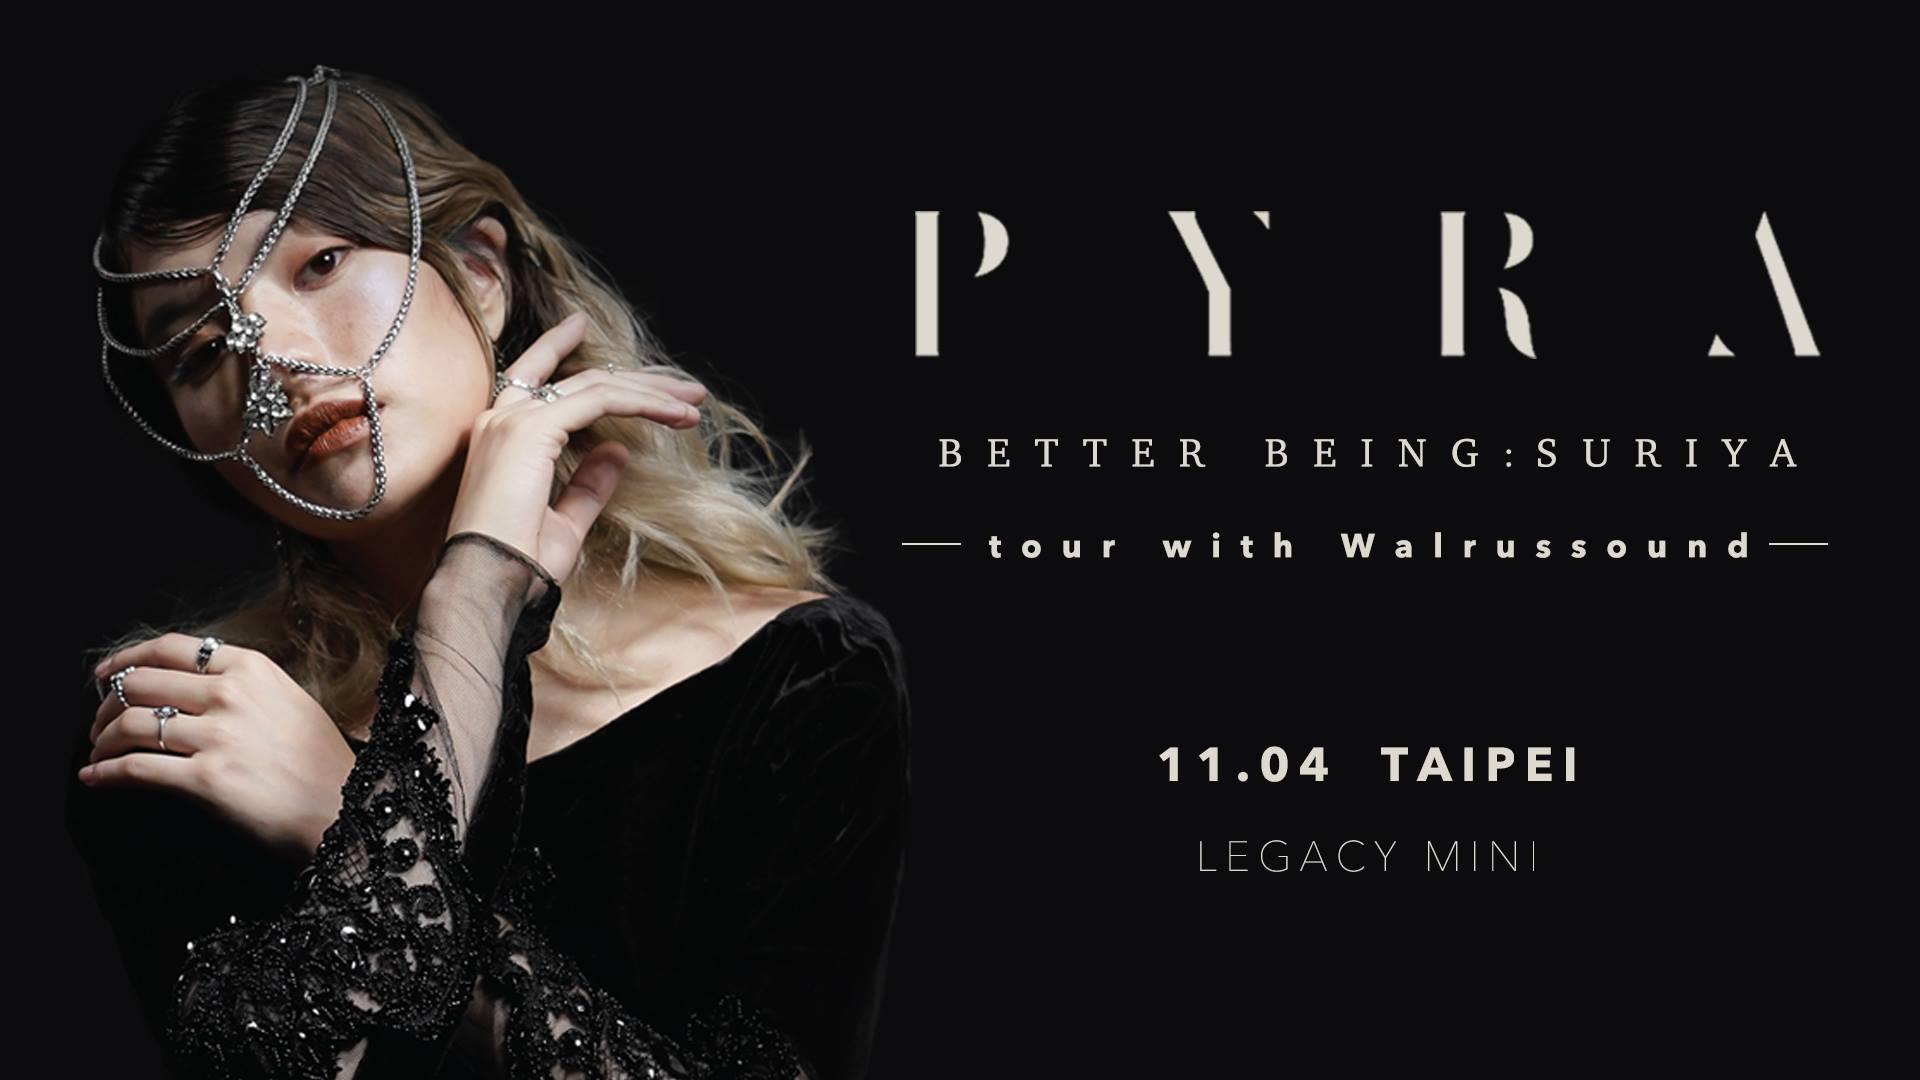 Pyra 'Better Being: Suriya Tour' with Walrussound – Taipei